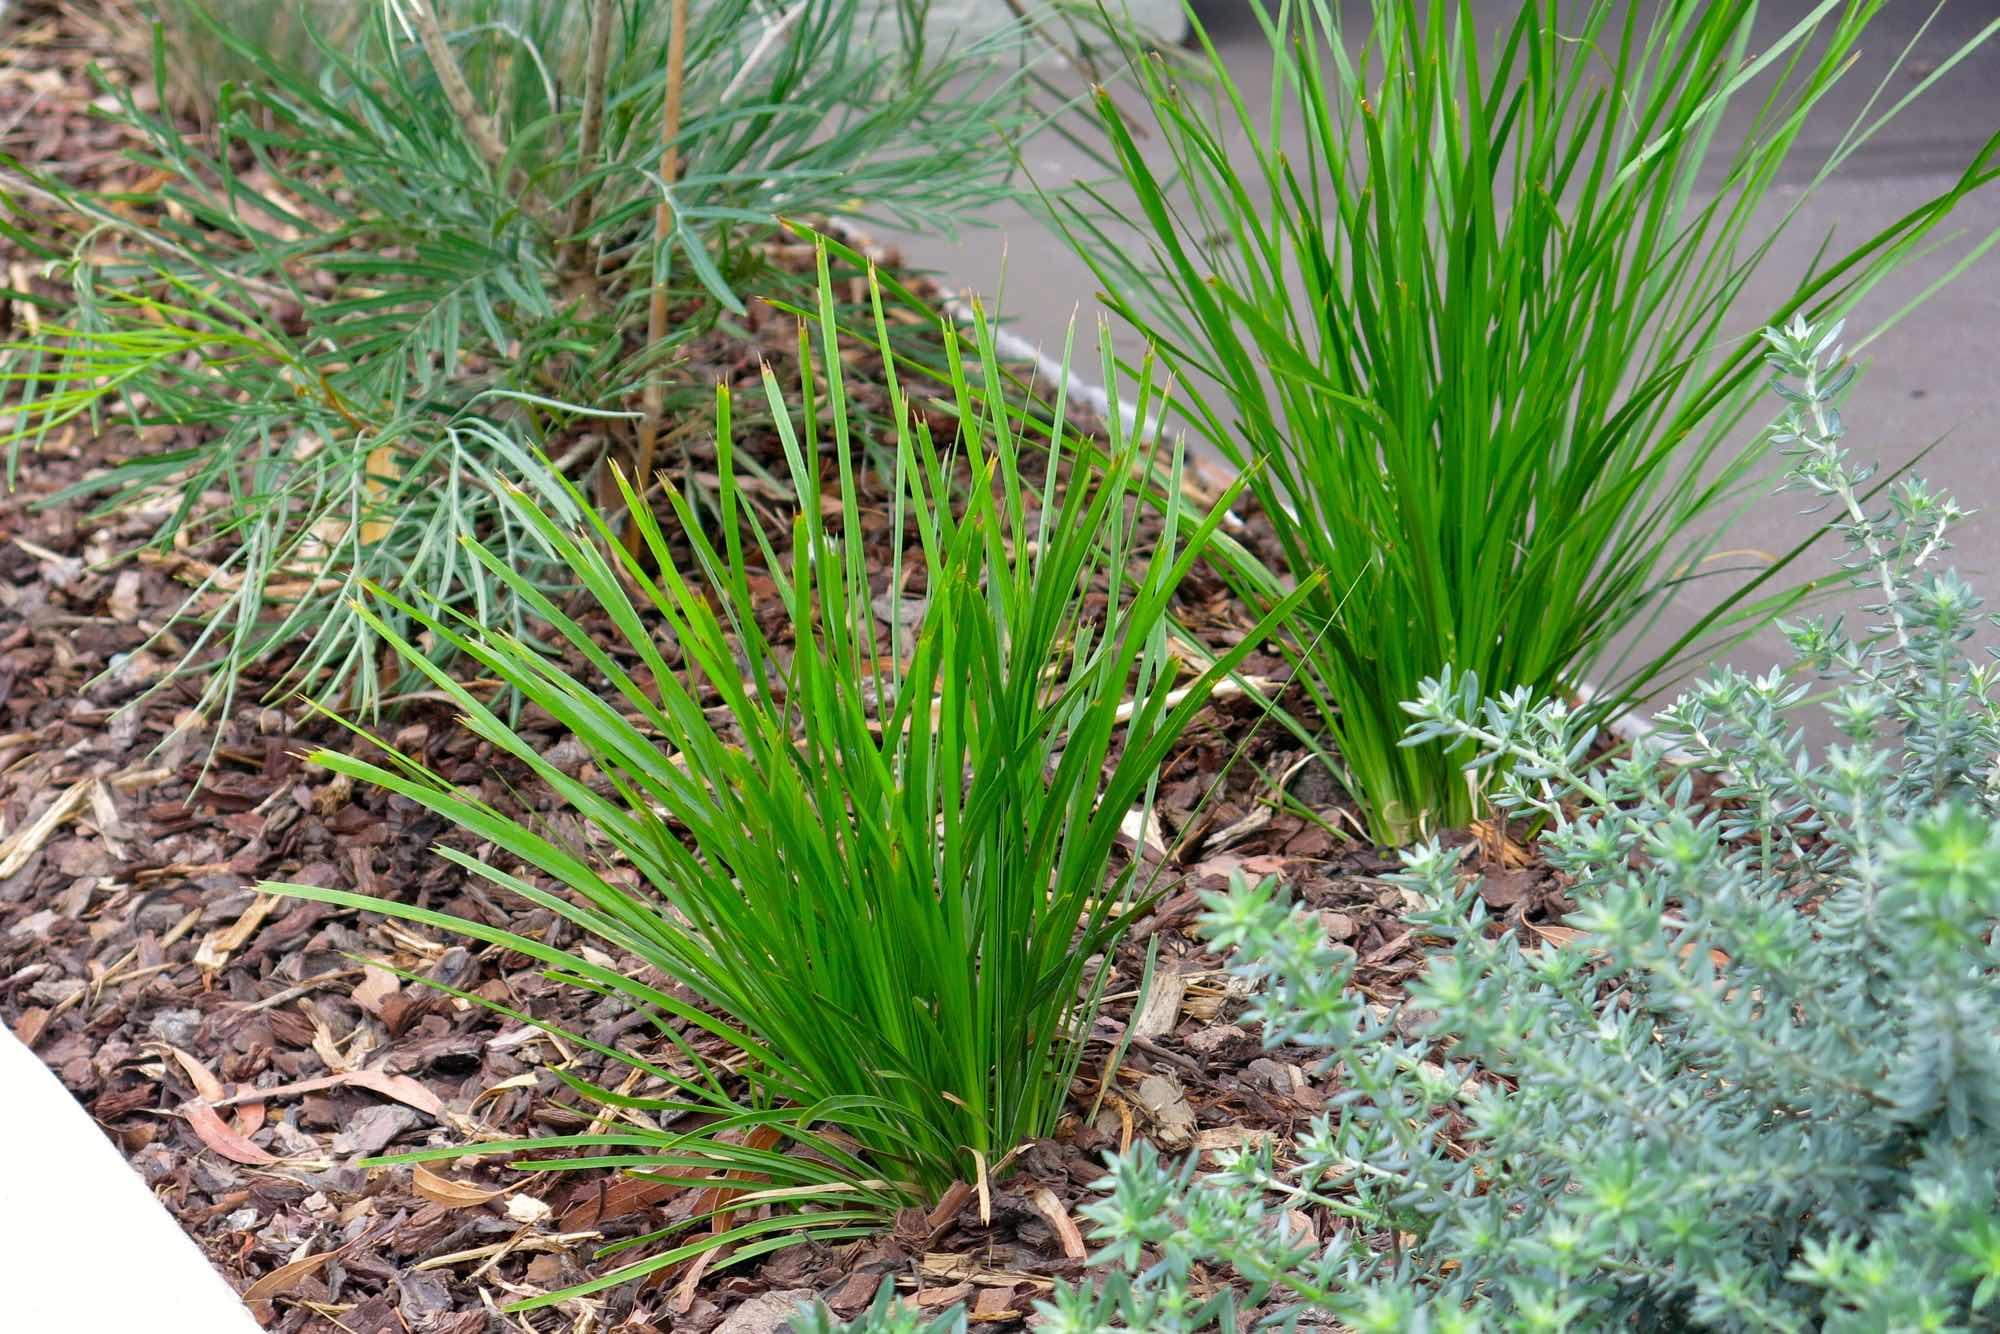 Australian Poa grass